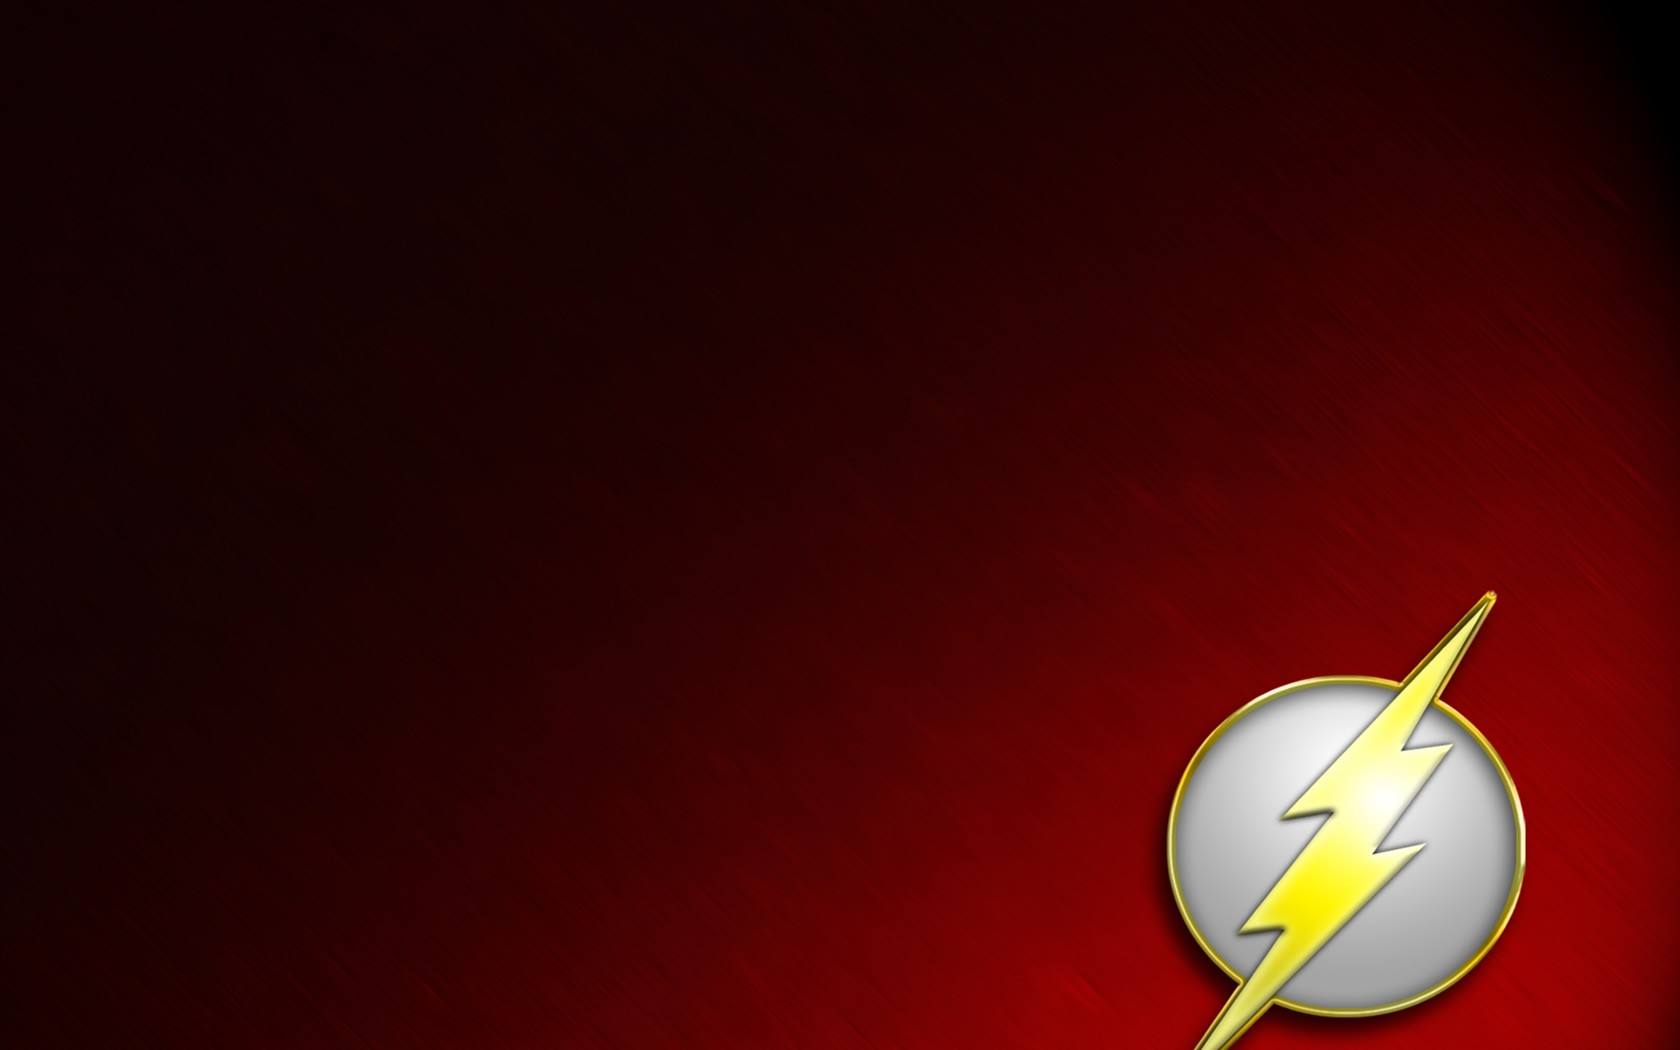 Flash Comics Logo The Flash Logo 1680x1050